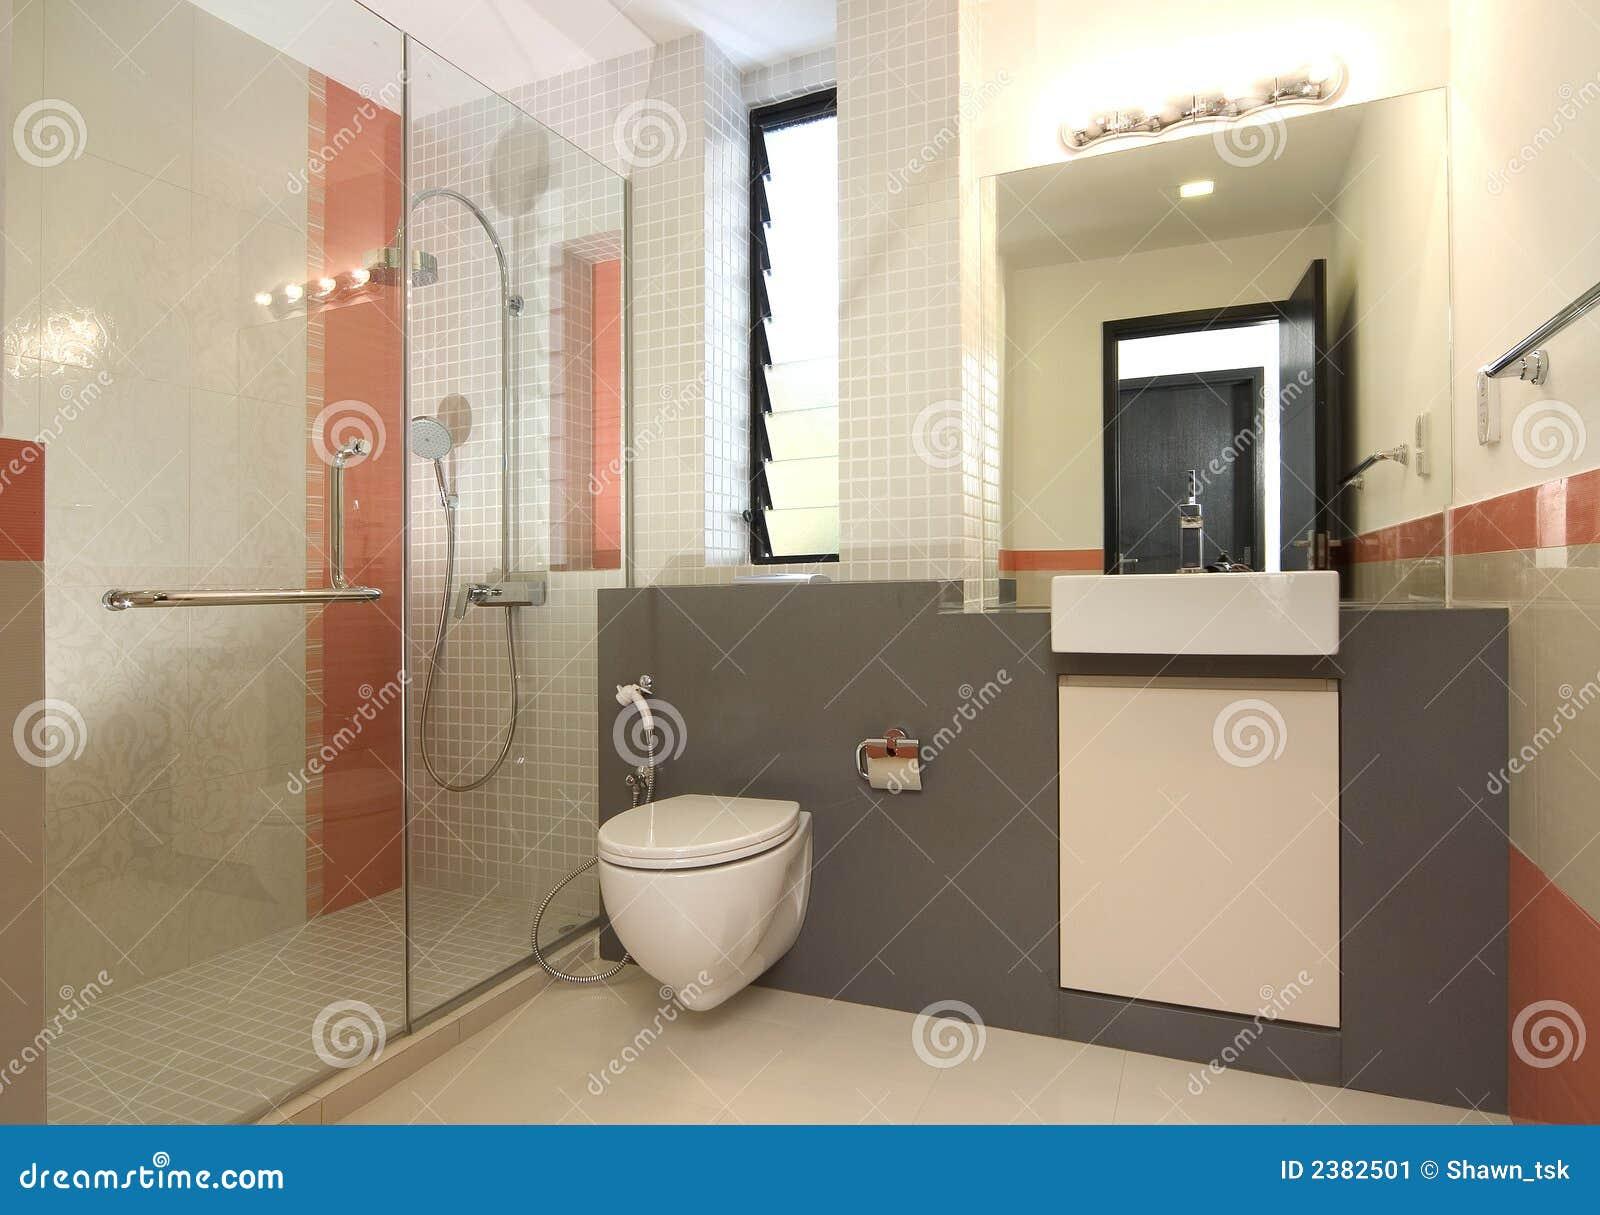 Interior Design - Bathroom Stock Image - Image: 2382501